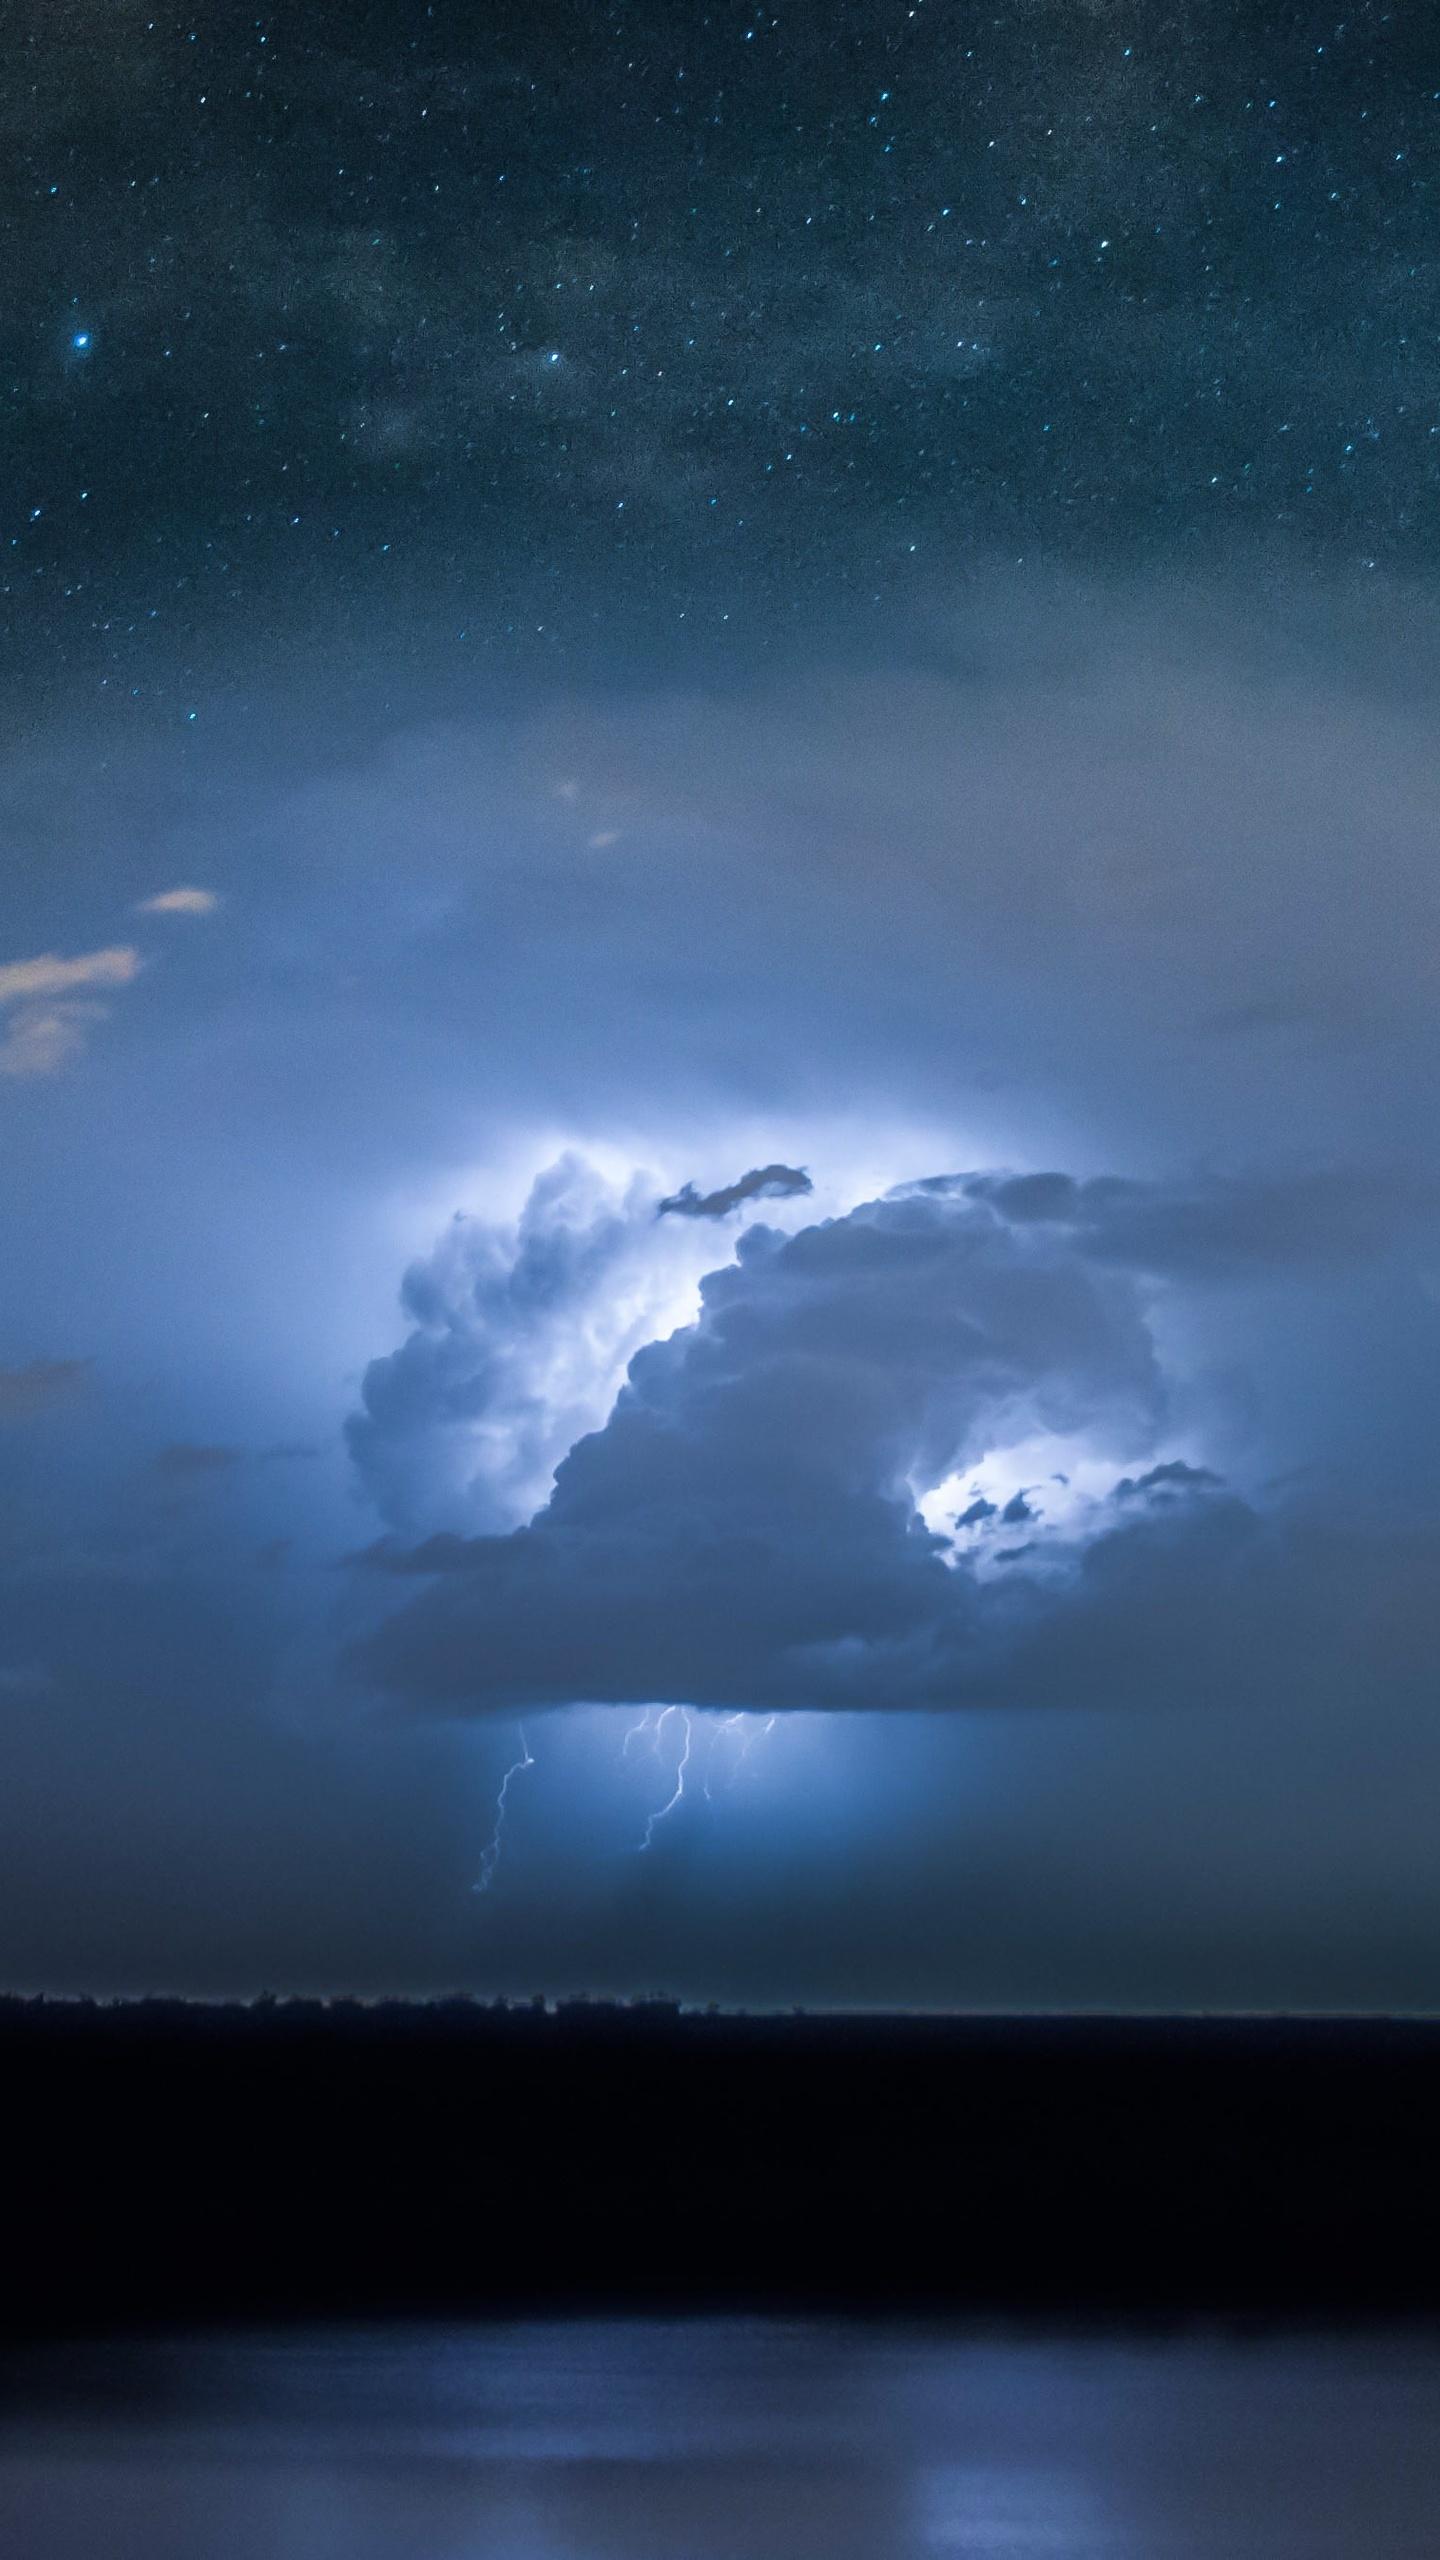 1440x2560 lightning thunder storm long exposure 4k samsung galaxy s6 s7 google pixel xl nexus - Lightning wallpaper 4k ...